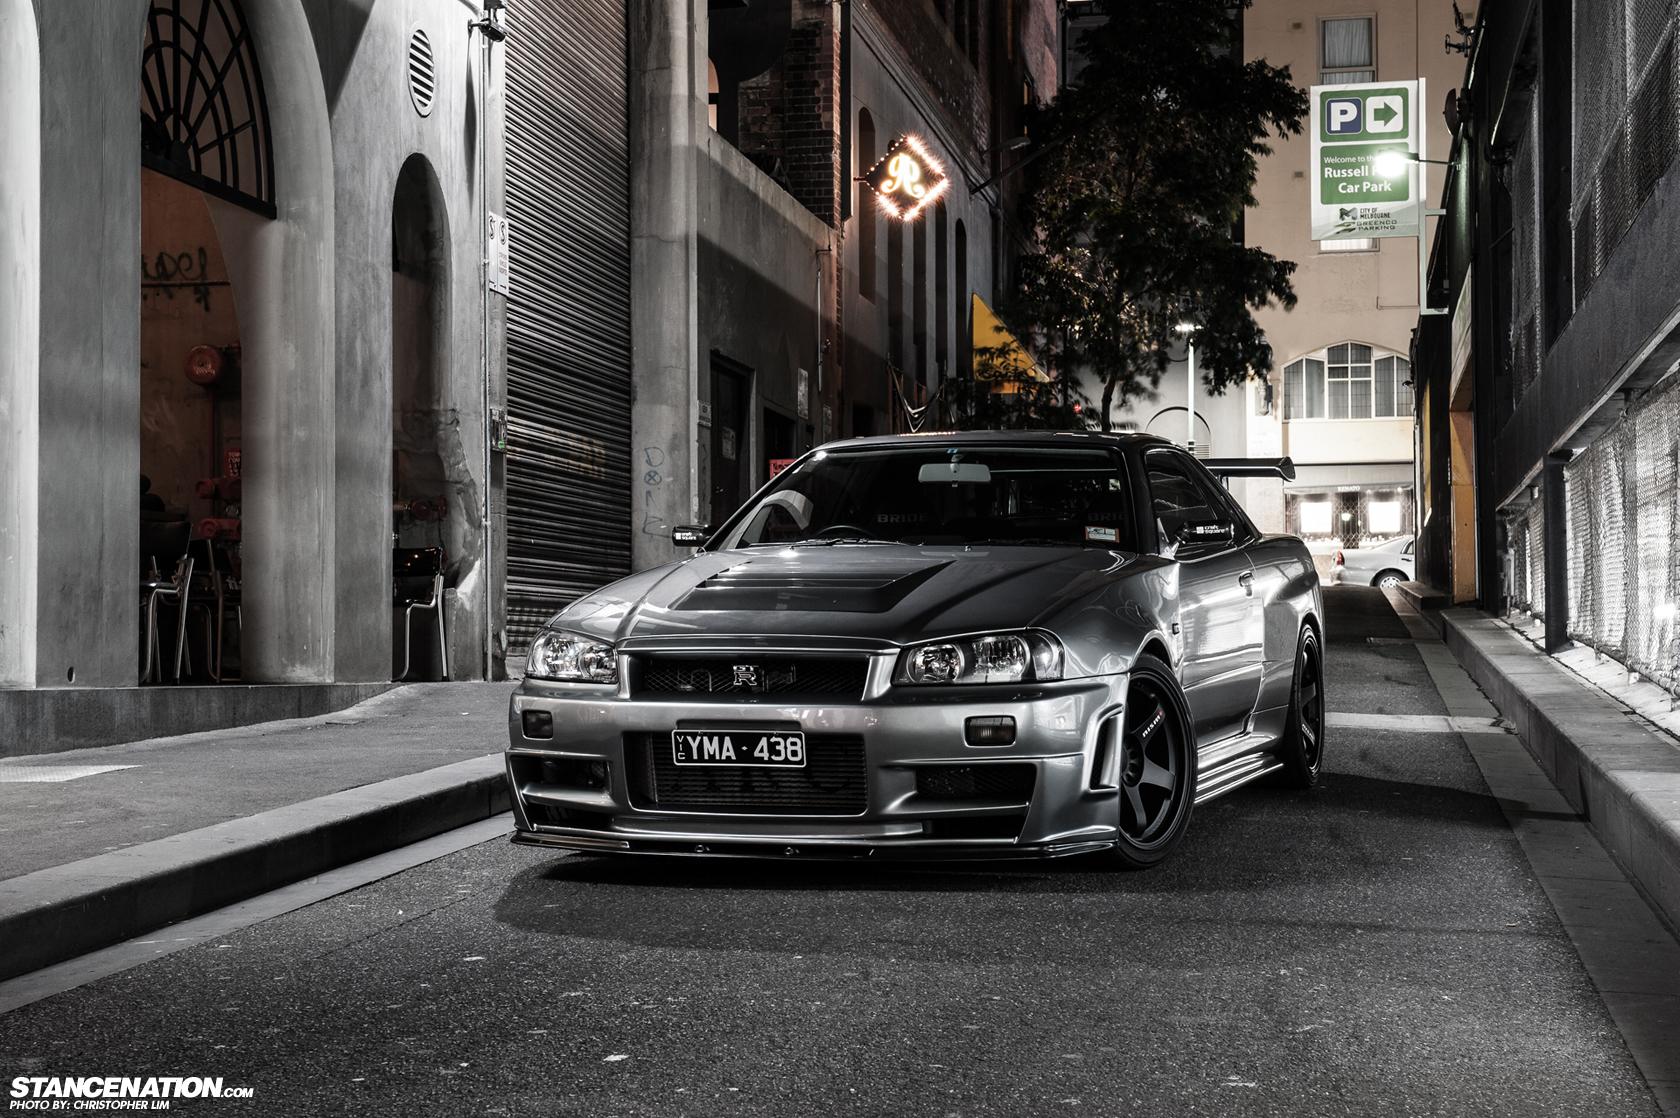 Nissan Skyline R34 Parking Hd Wallpaper Elegant Wallpapers